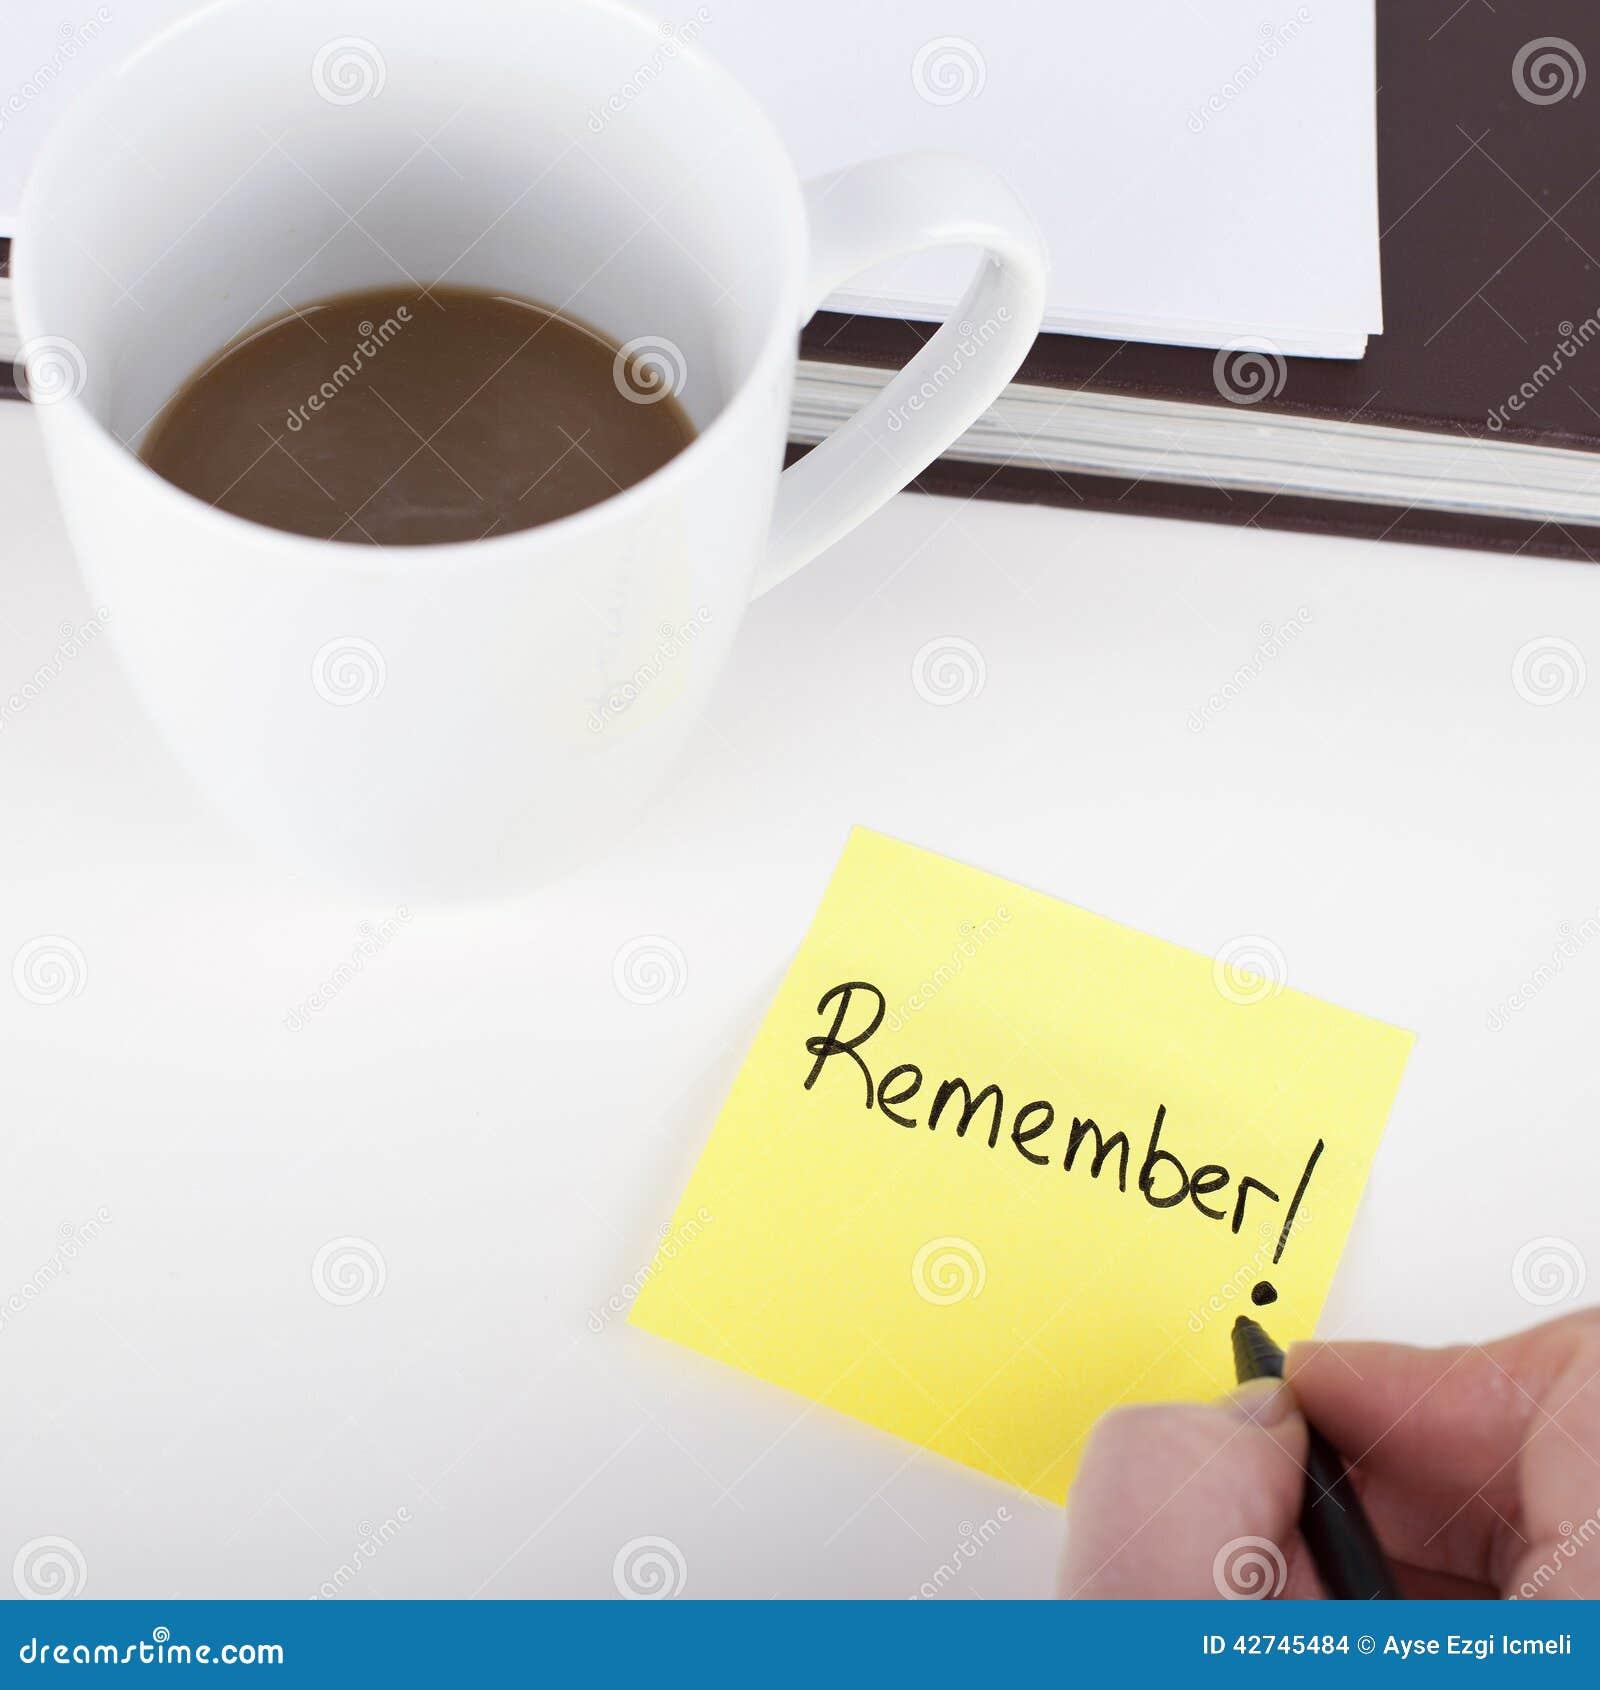 Ricordi la nota